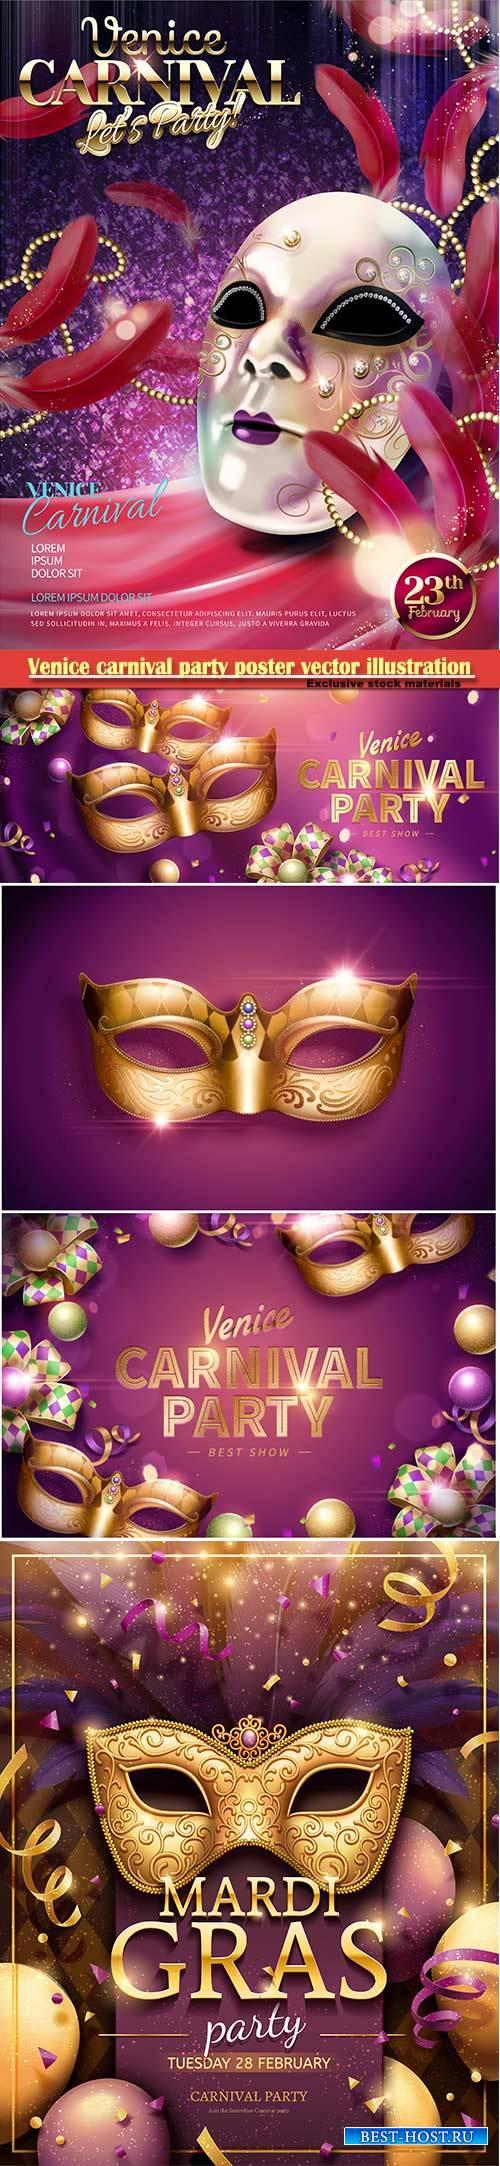 Venice carnival design vector illustration, Mardi gras # 2